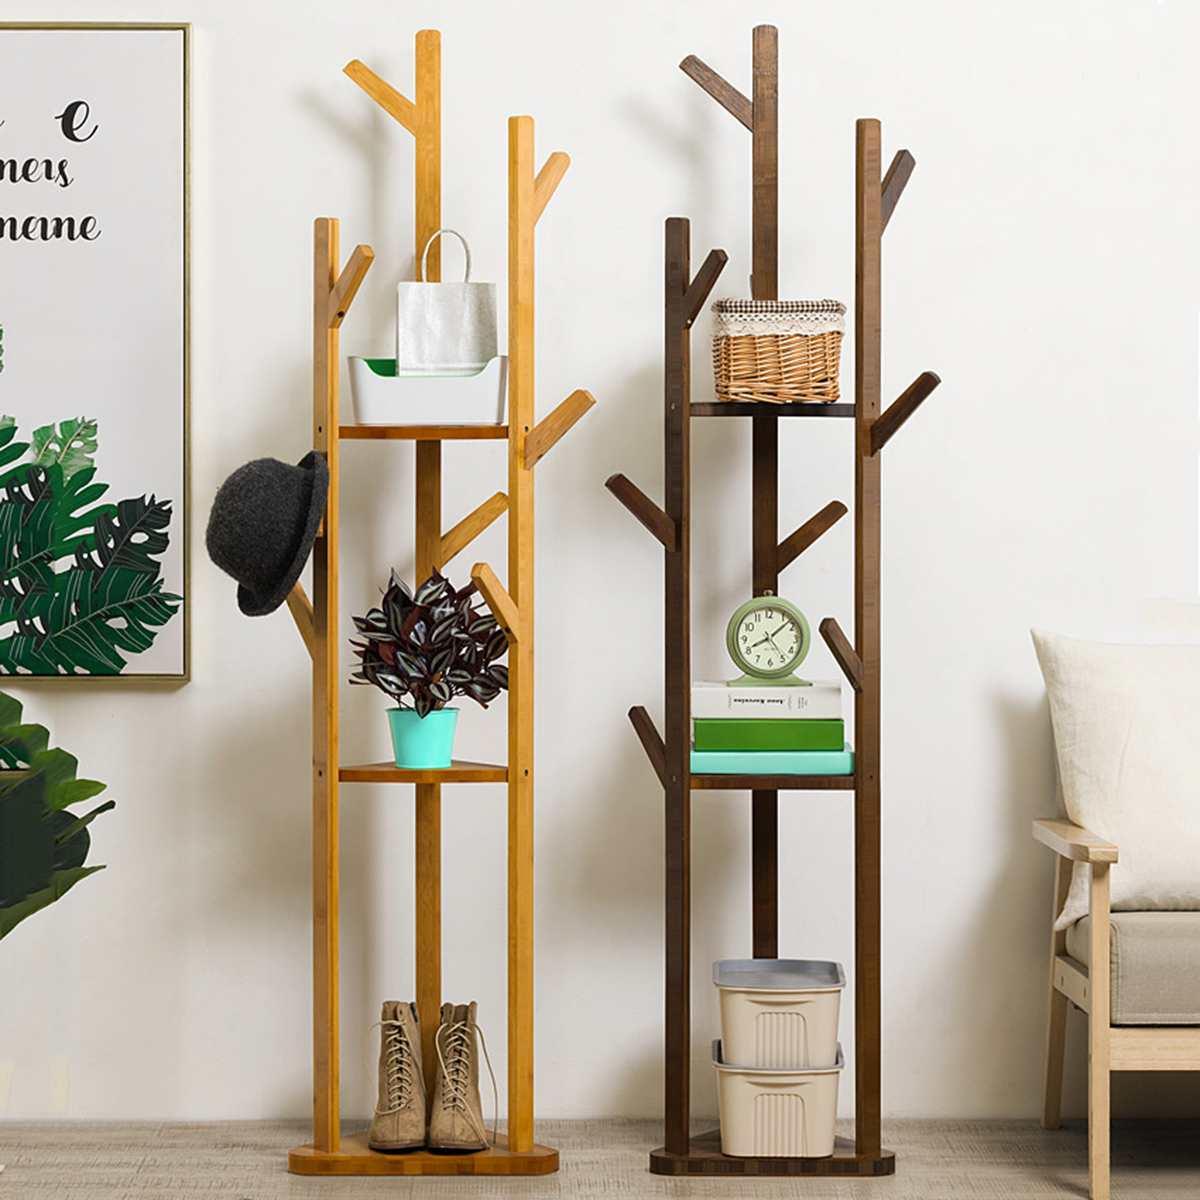 8 Hooks 3-Layer Shelf Solid Bamboo Hanger Floor Standing Coat Rack Home Furniture Clothes Hanging Storage Rack